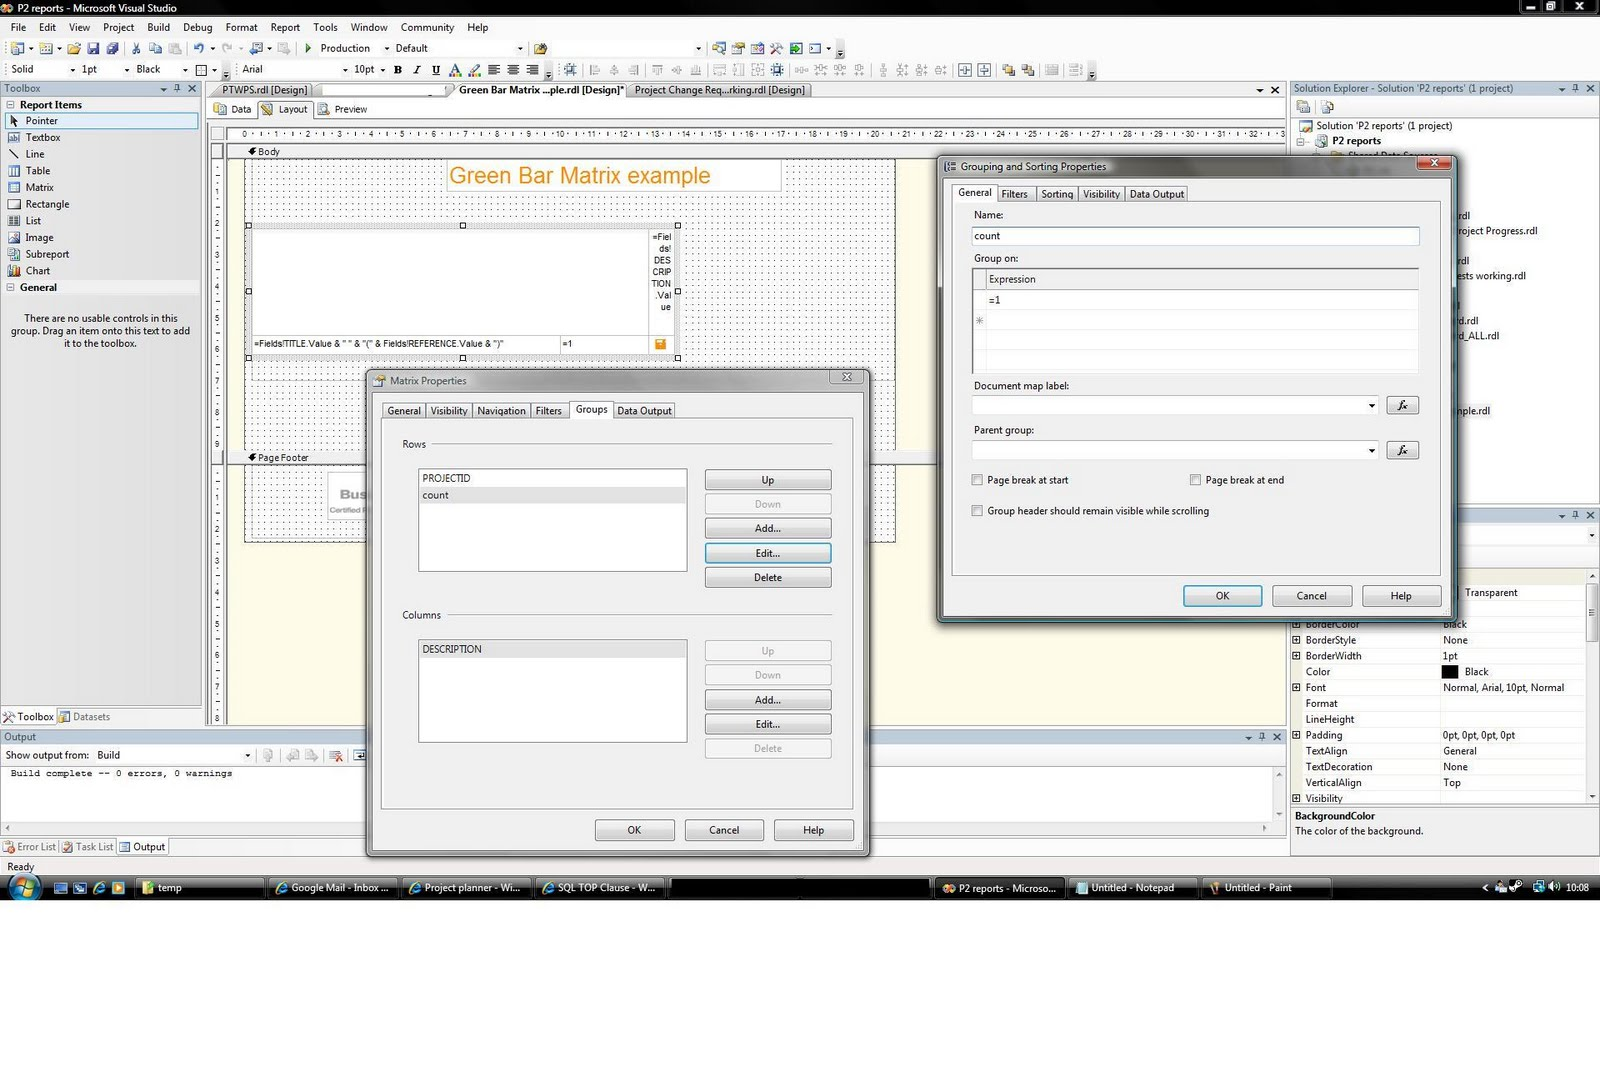 http://4.bp.blogspot.com/_mCjyv6ByaiI/S82DdAXsn9I/AAAAAAAAB74/yI5rU35yER0/s1600/Green+Bar+Matrix+add+inner+group+1.jpg